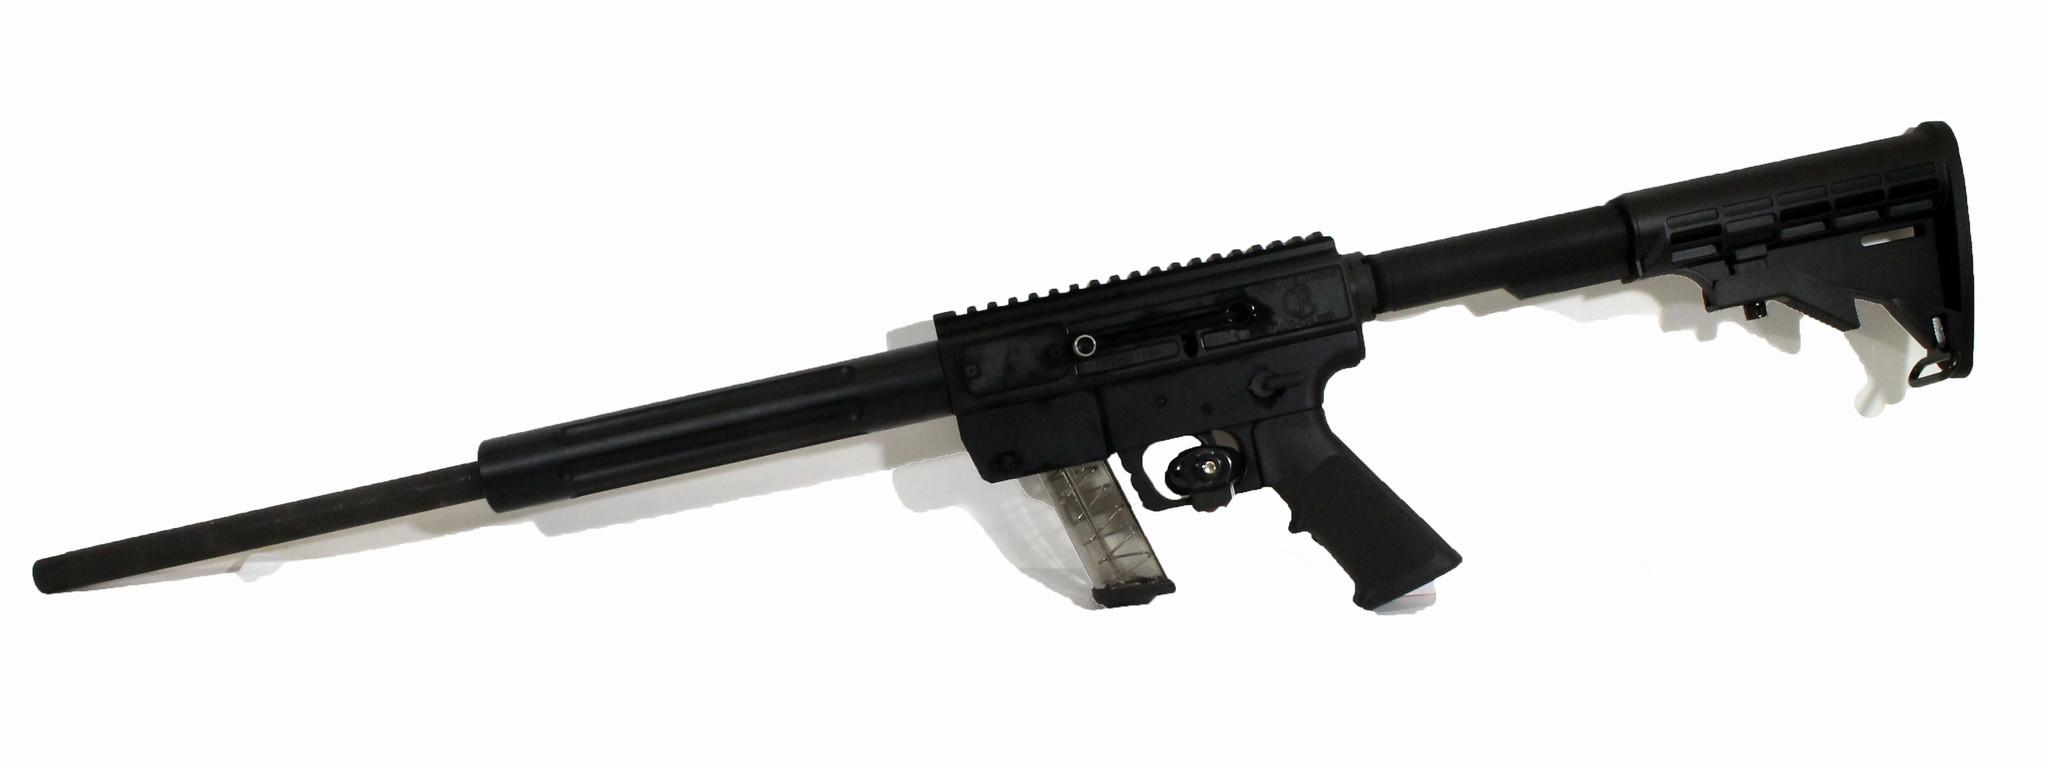 JRC 9mm Glock Mag 10 Shot 18 6